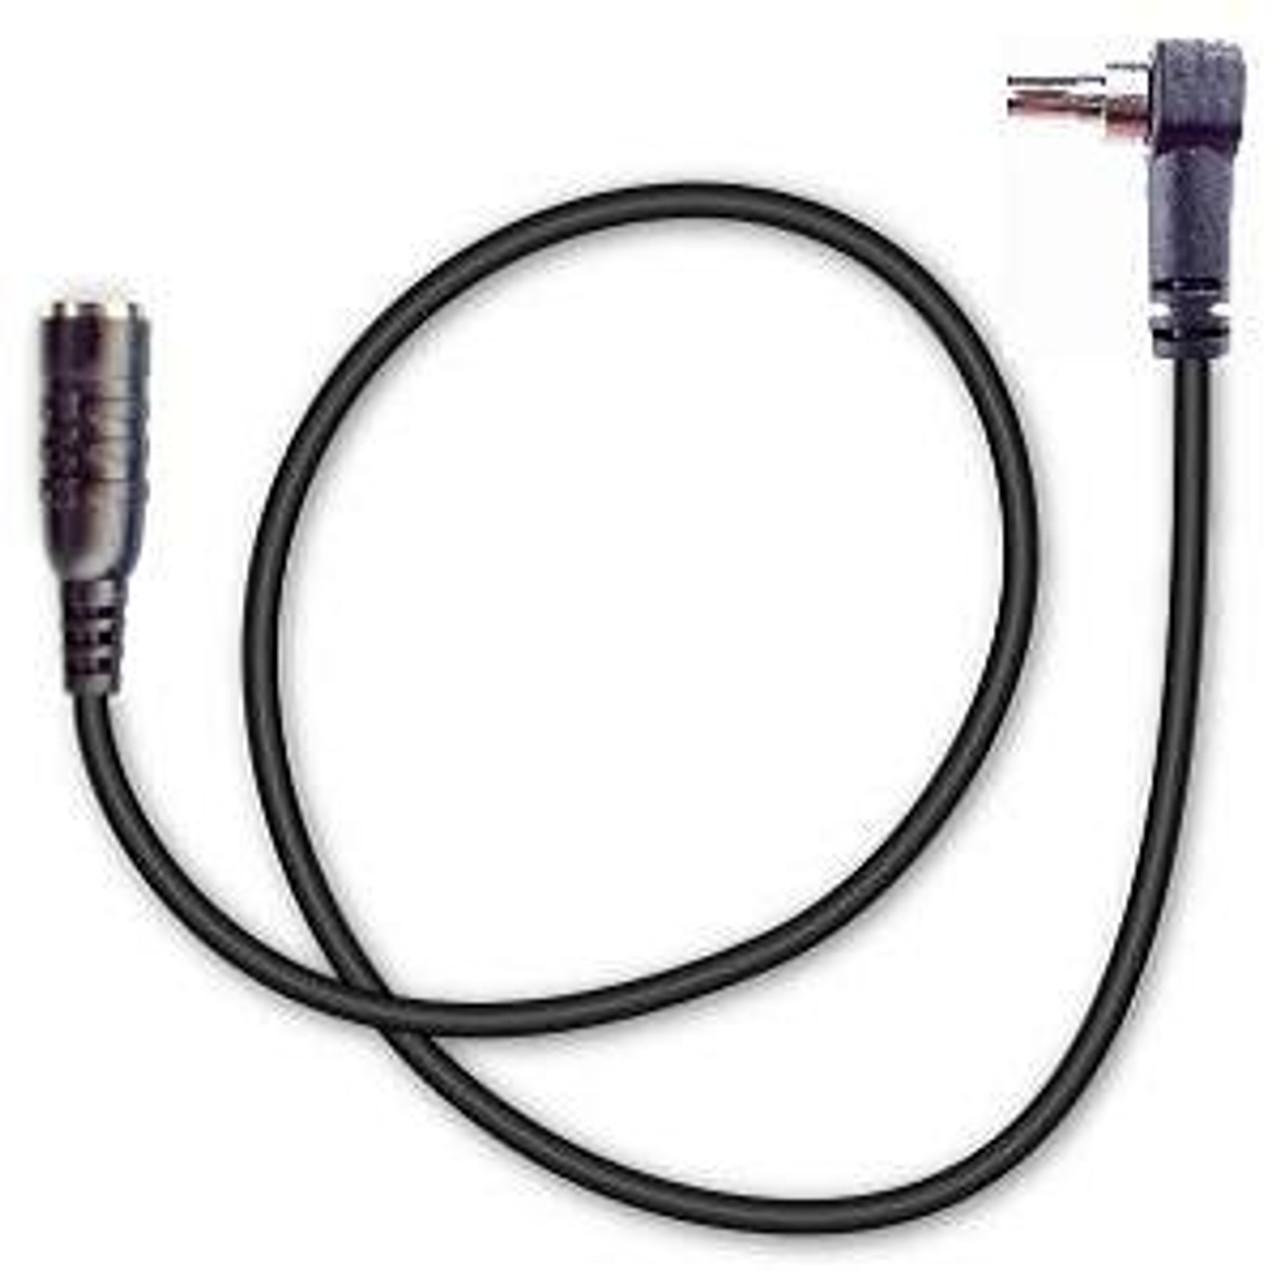 Franklin Wireless Sprint U600 4G Antenna Adapter